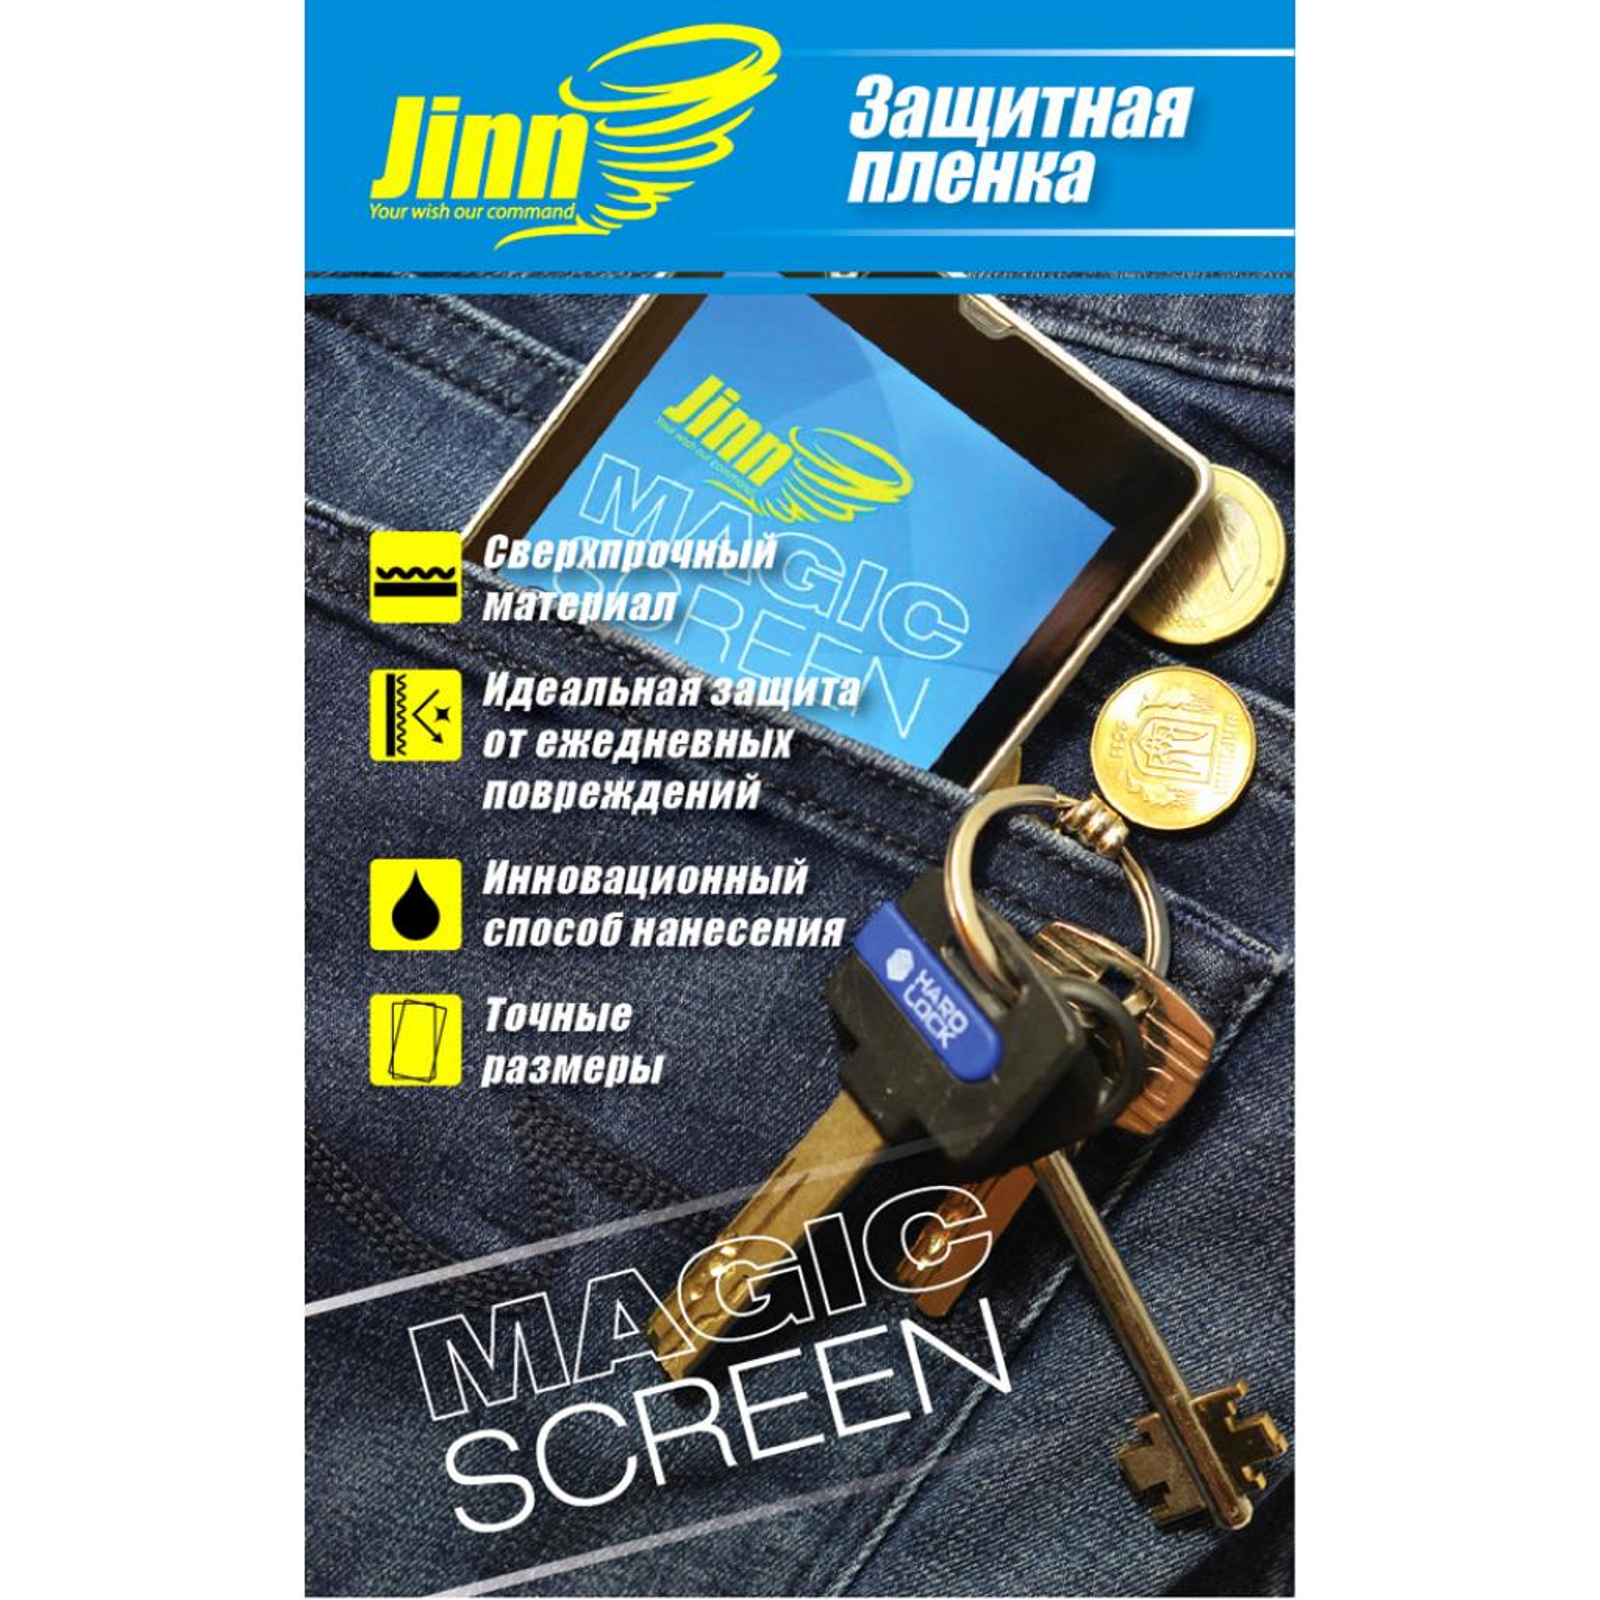 Пленка защитная JINN ультрапрочная Magic Screen для Lenovo IdeaPhone A820 (Lenovo IdeaPhone A820 front)